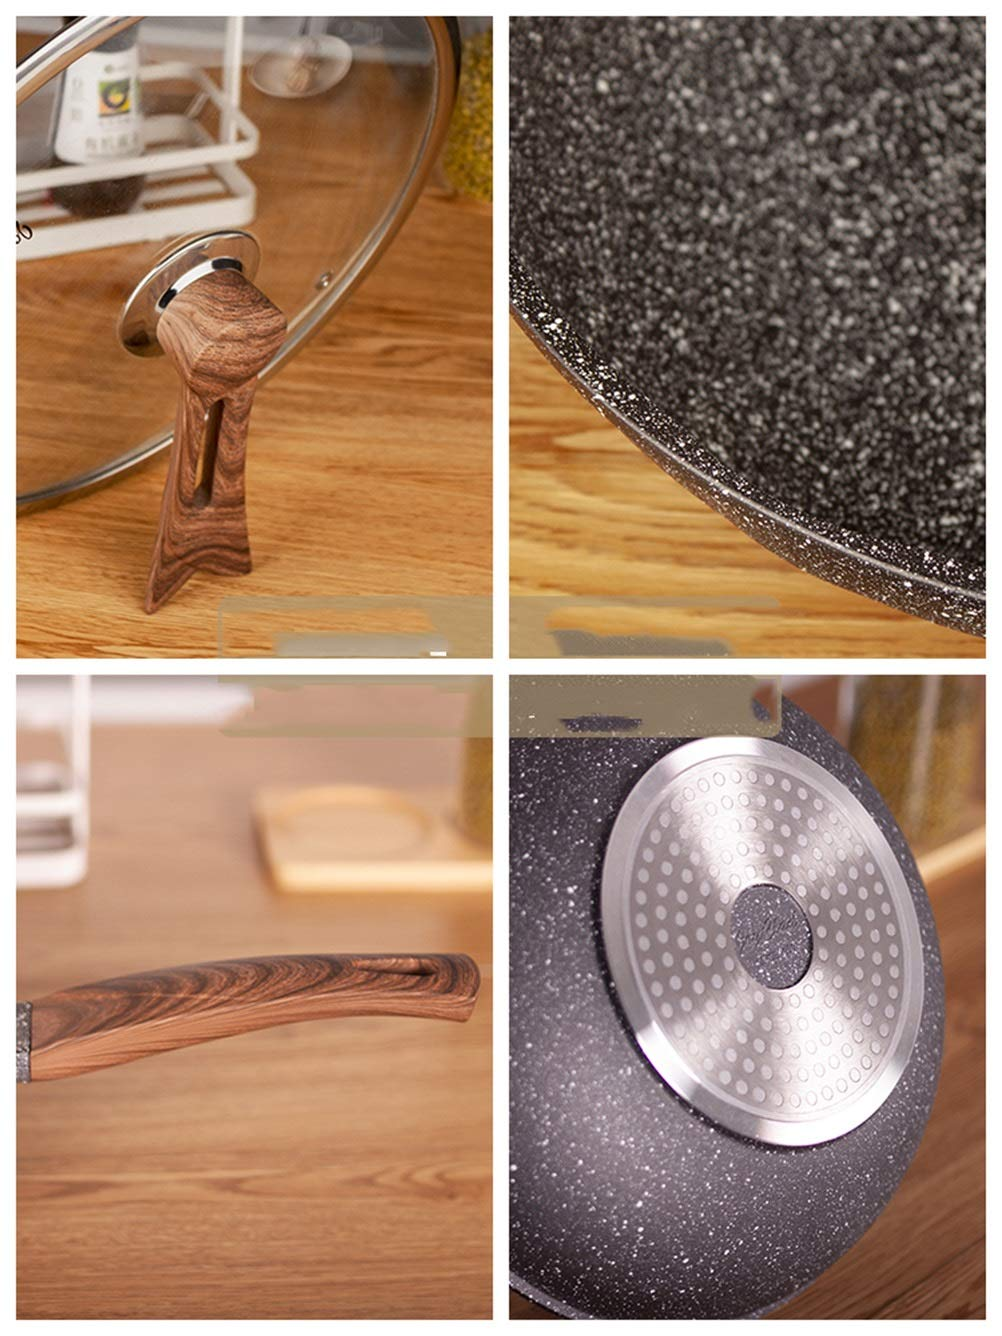 WYQSZ Wok - home flat wok non-stick pan less smoked kitchen cooking multi-function wok -fry pan 2365 (Design : B) by WYQSZ (Image #6)